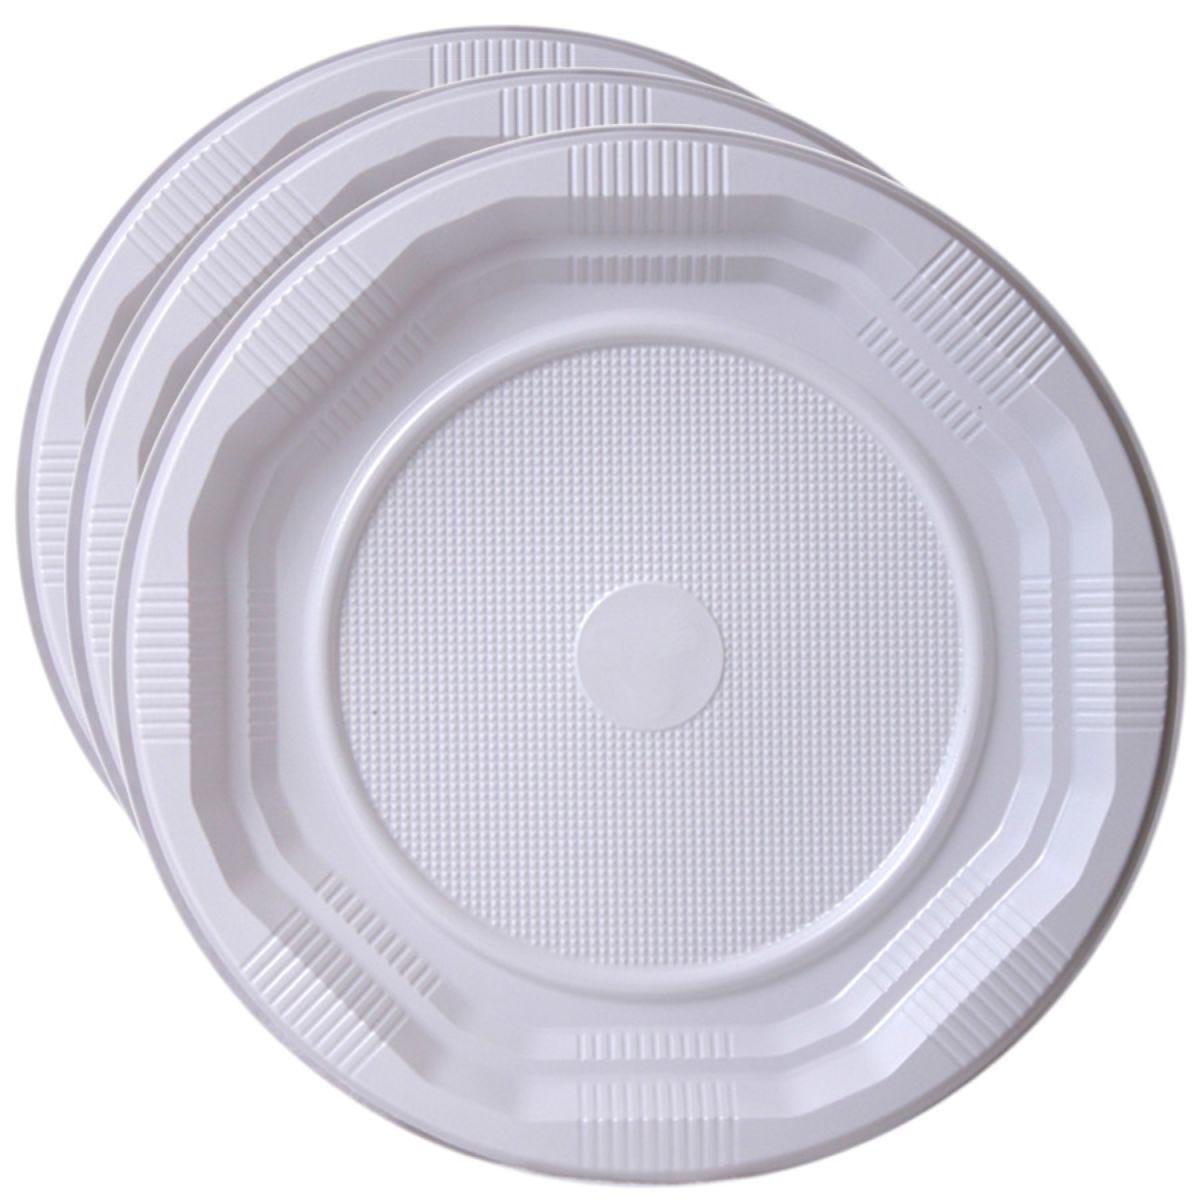 Essential Housewares Disposable Plastic Plates - 25 Pack